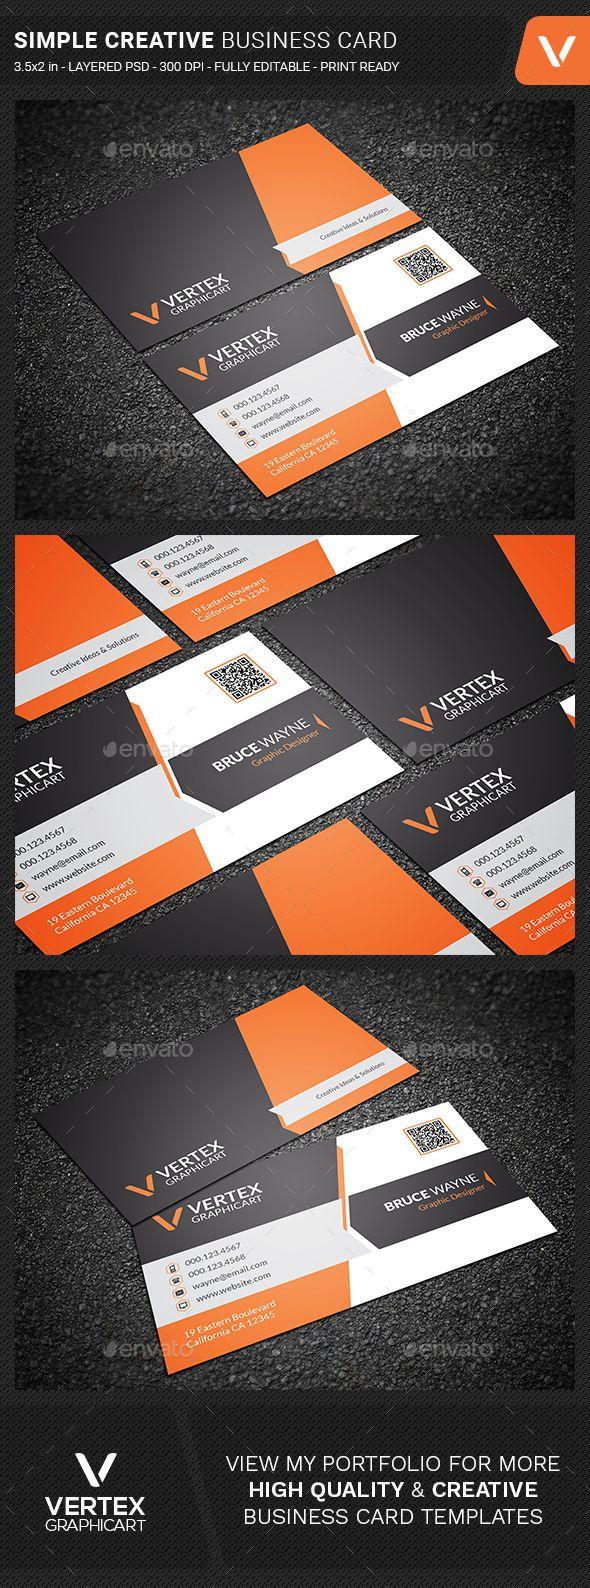 400 best Business Cards images on Pinterest | Business card design ...